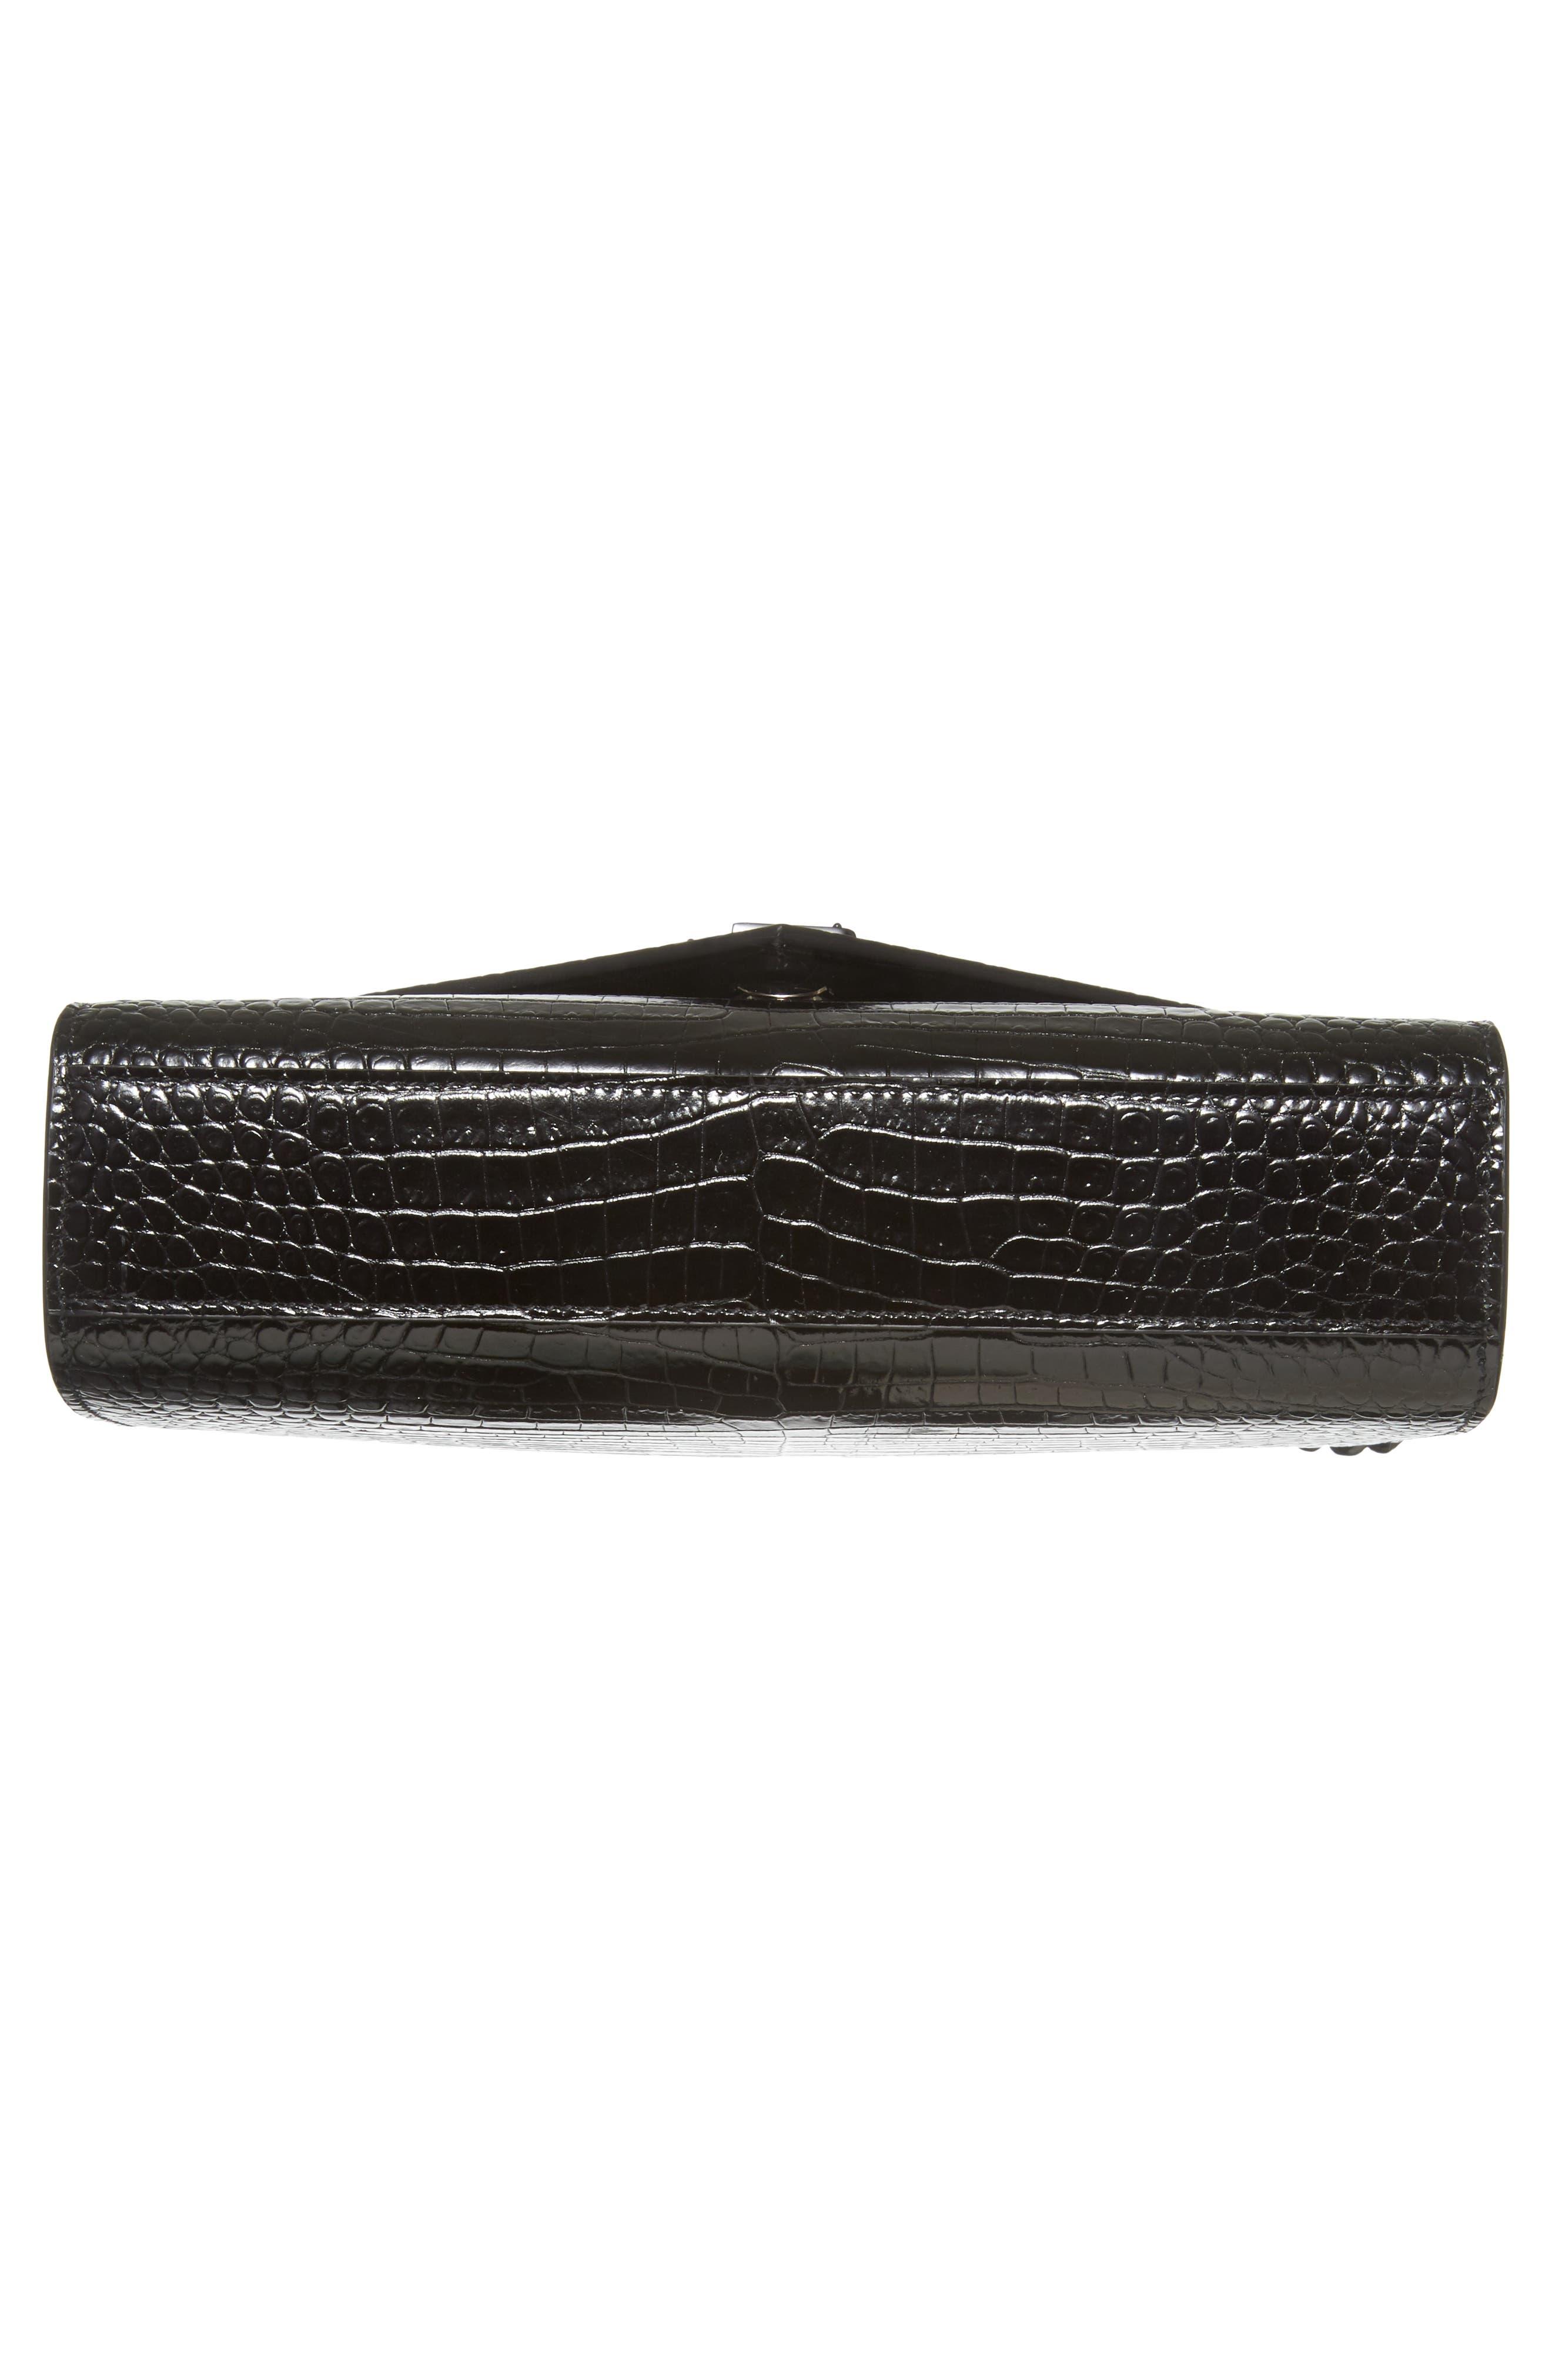 Medium Croc-Embossed Calfskin Shoulder Bag,                             Alternate thumbnail 6, color,                             Noir